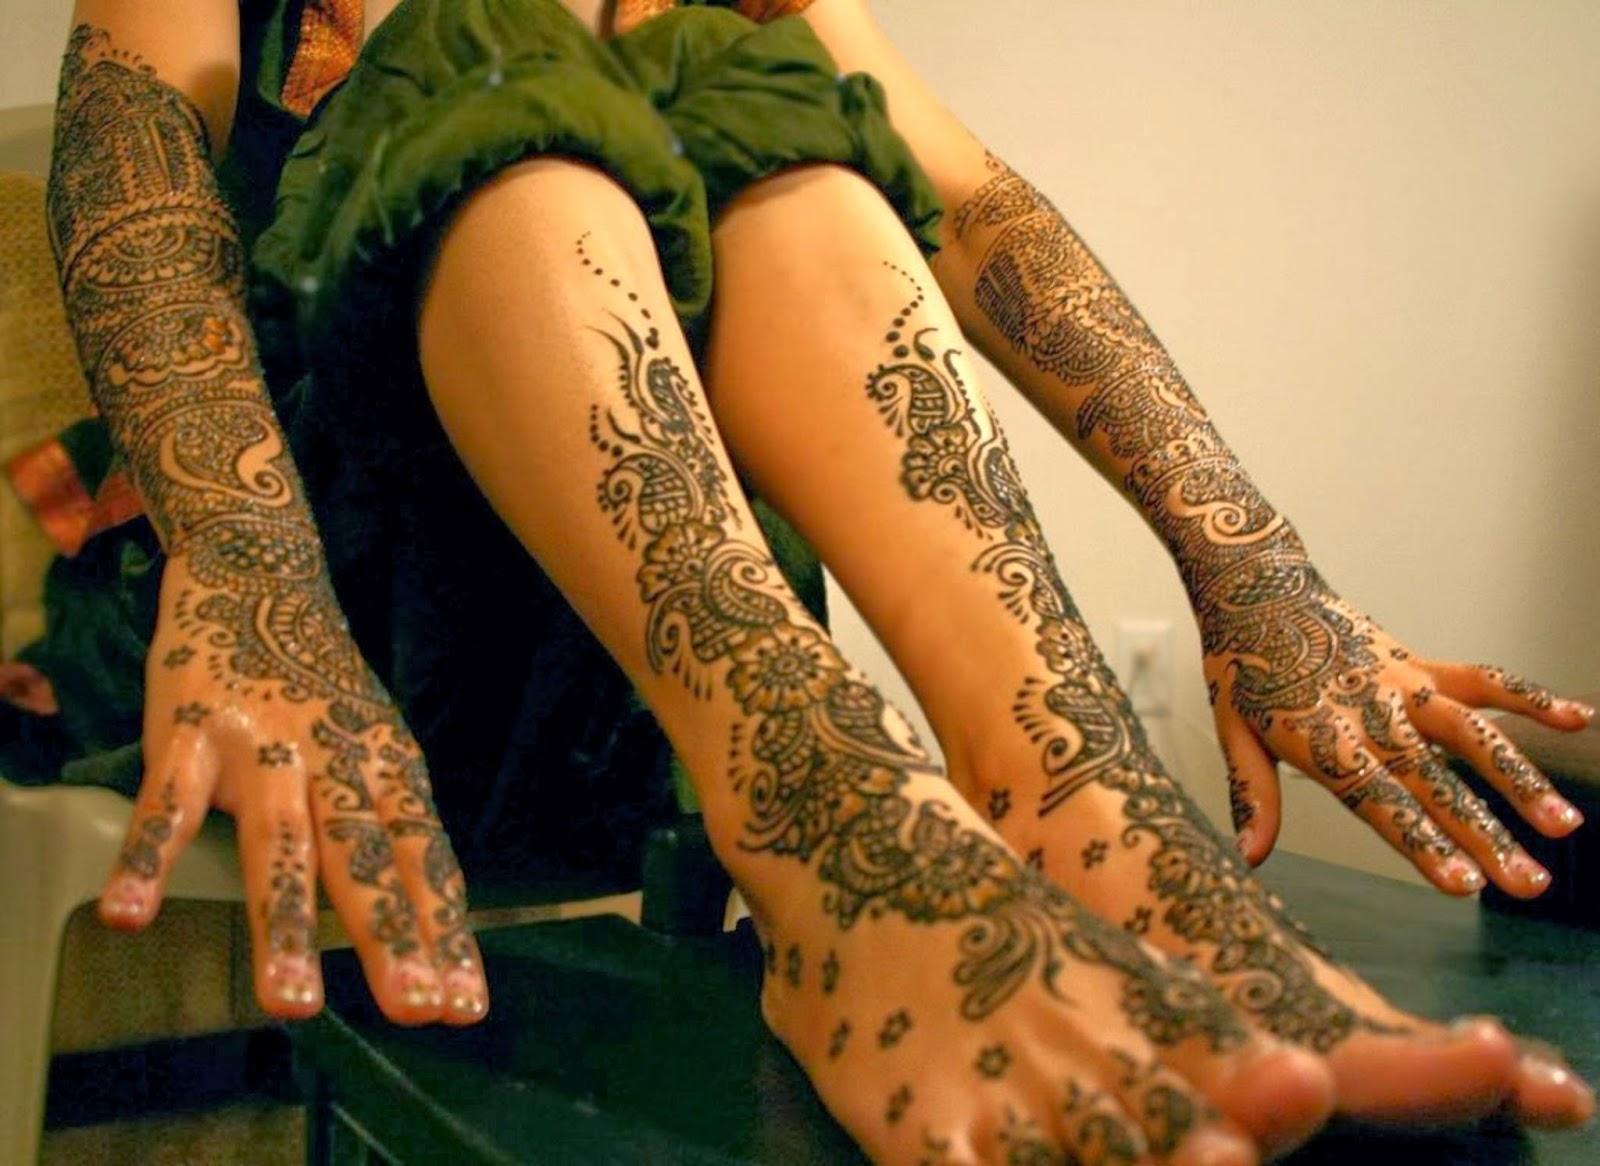 Bridal Mehndi Feet Wallpapers : Bridal mehndi designs new feet and hand